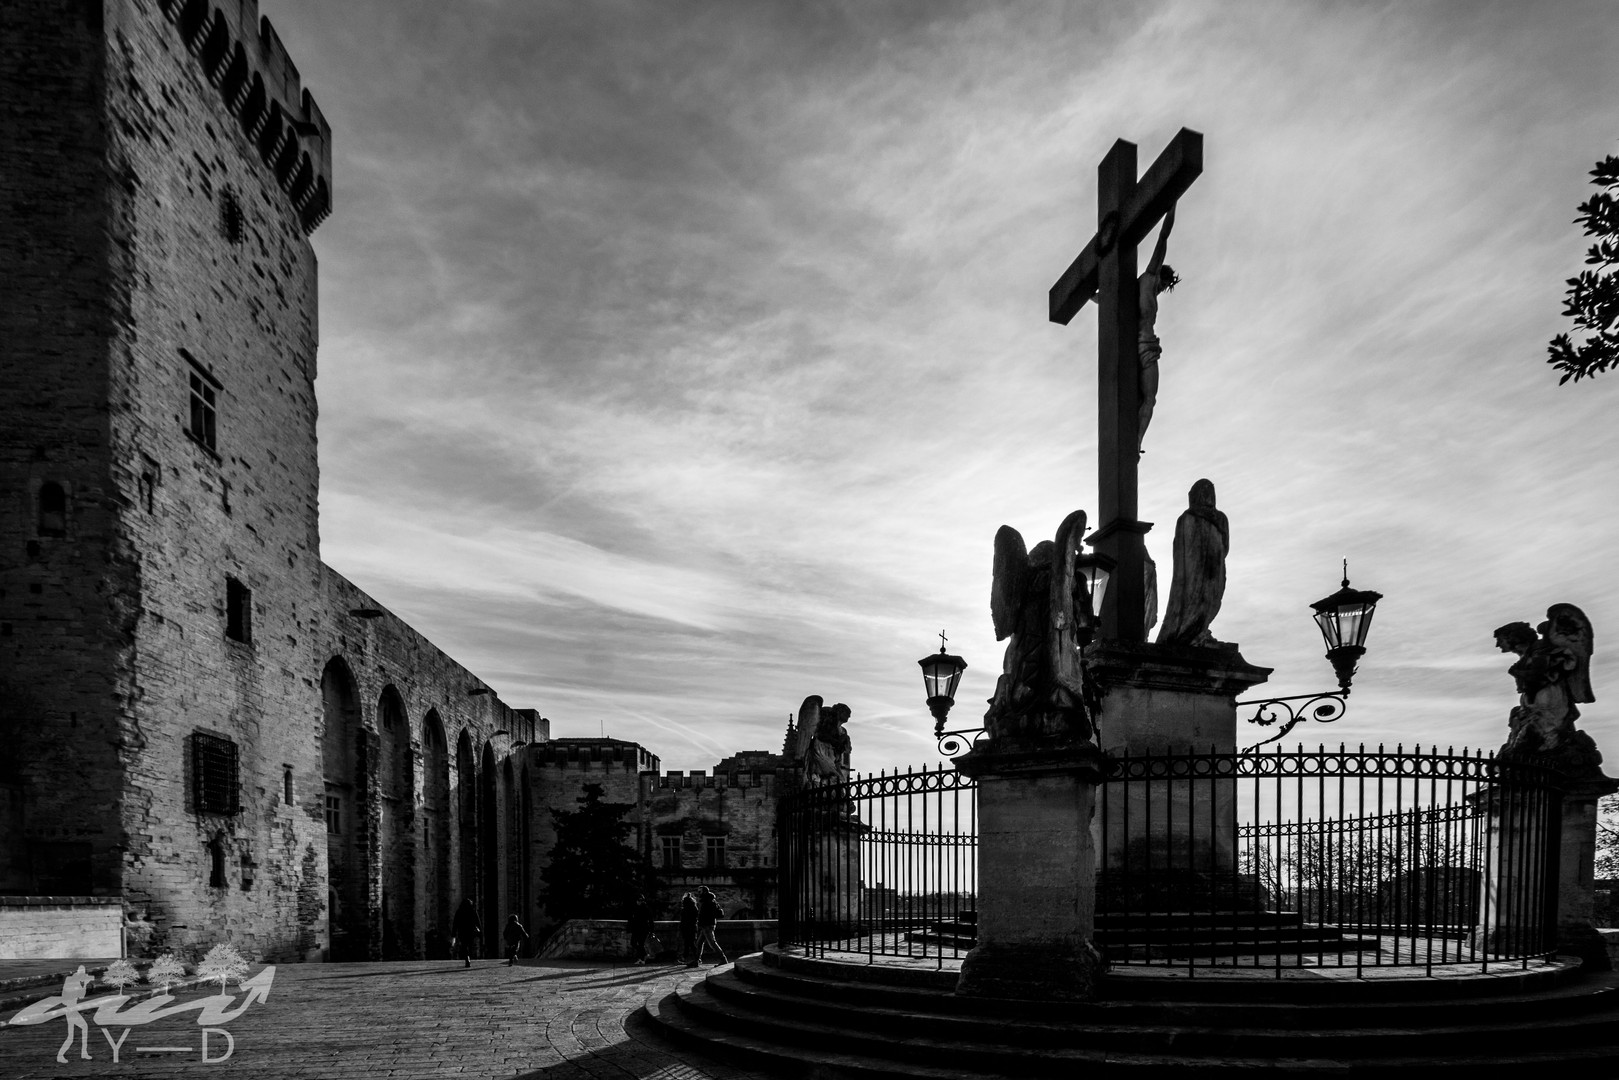 Palais des papes, Avignon, Wallophoto 2019